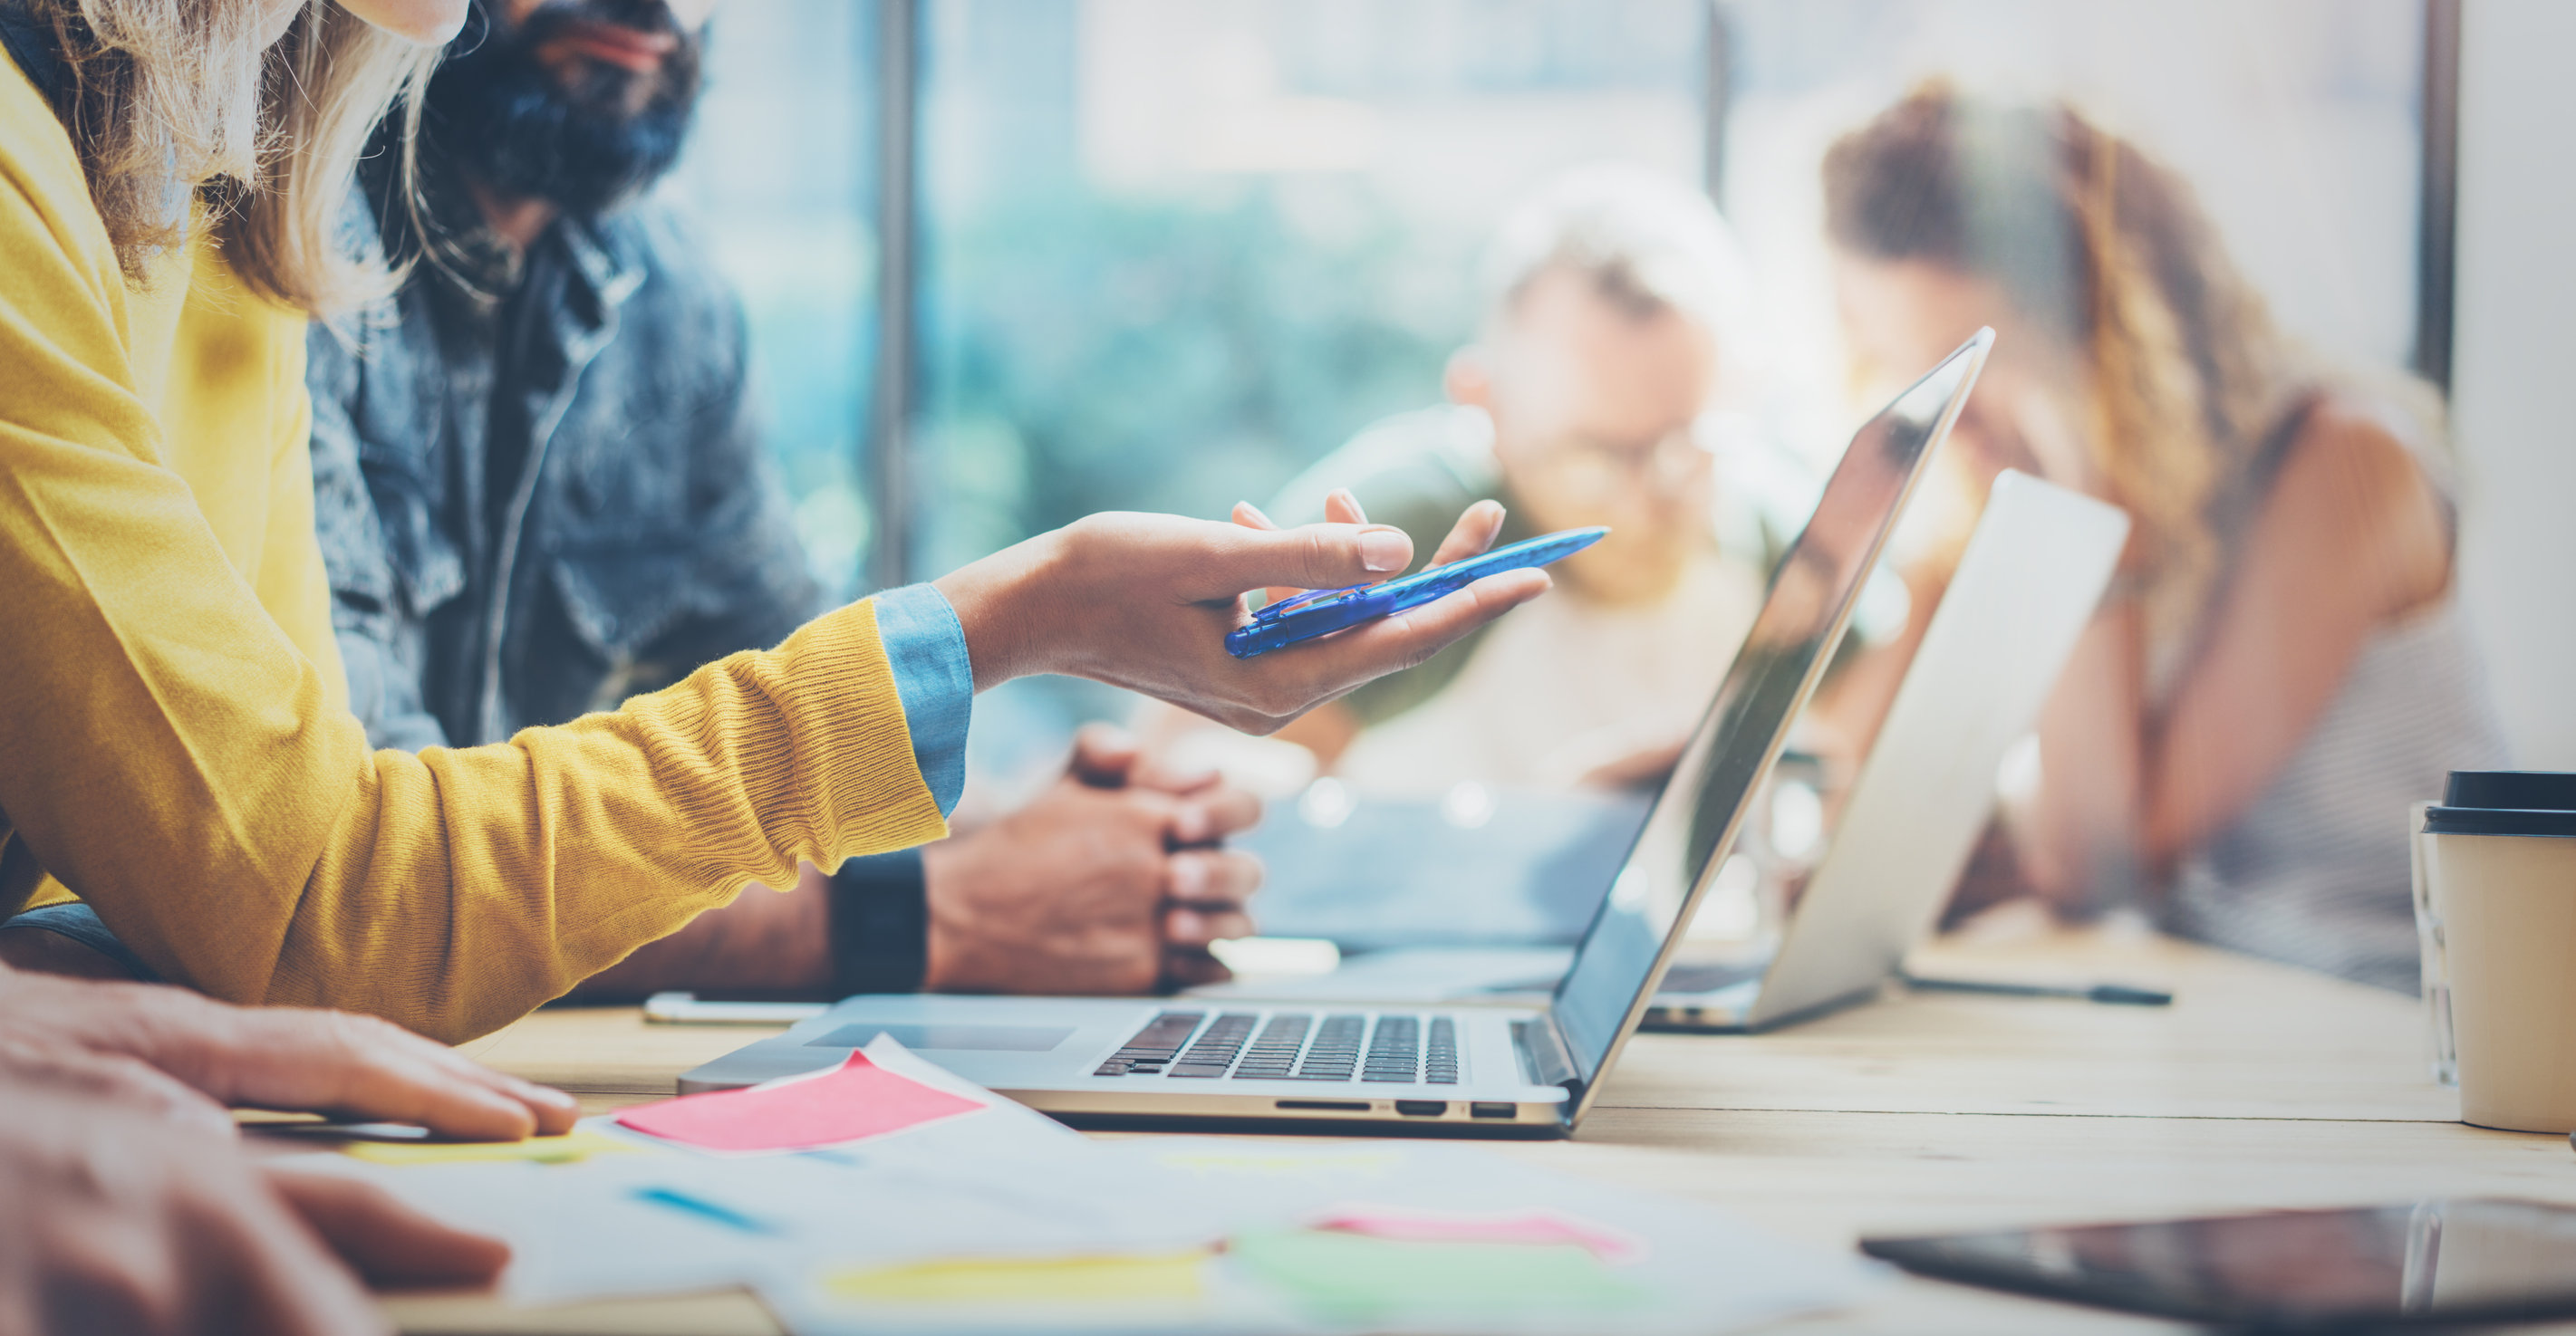 5 Steps Towards Organizational Agility